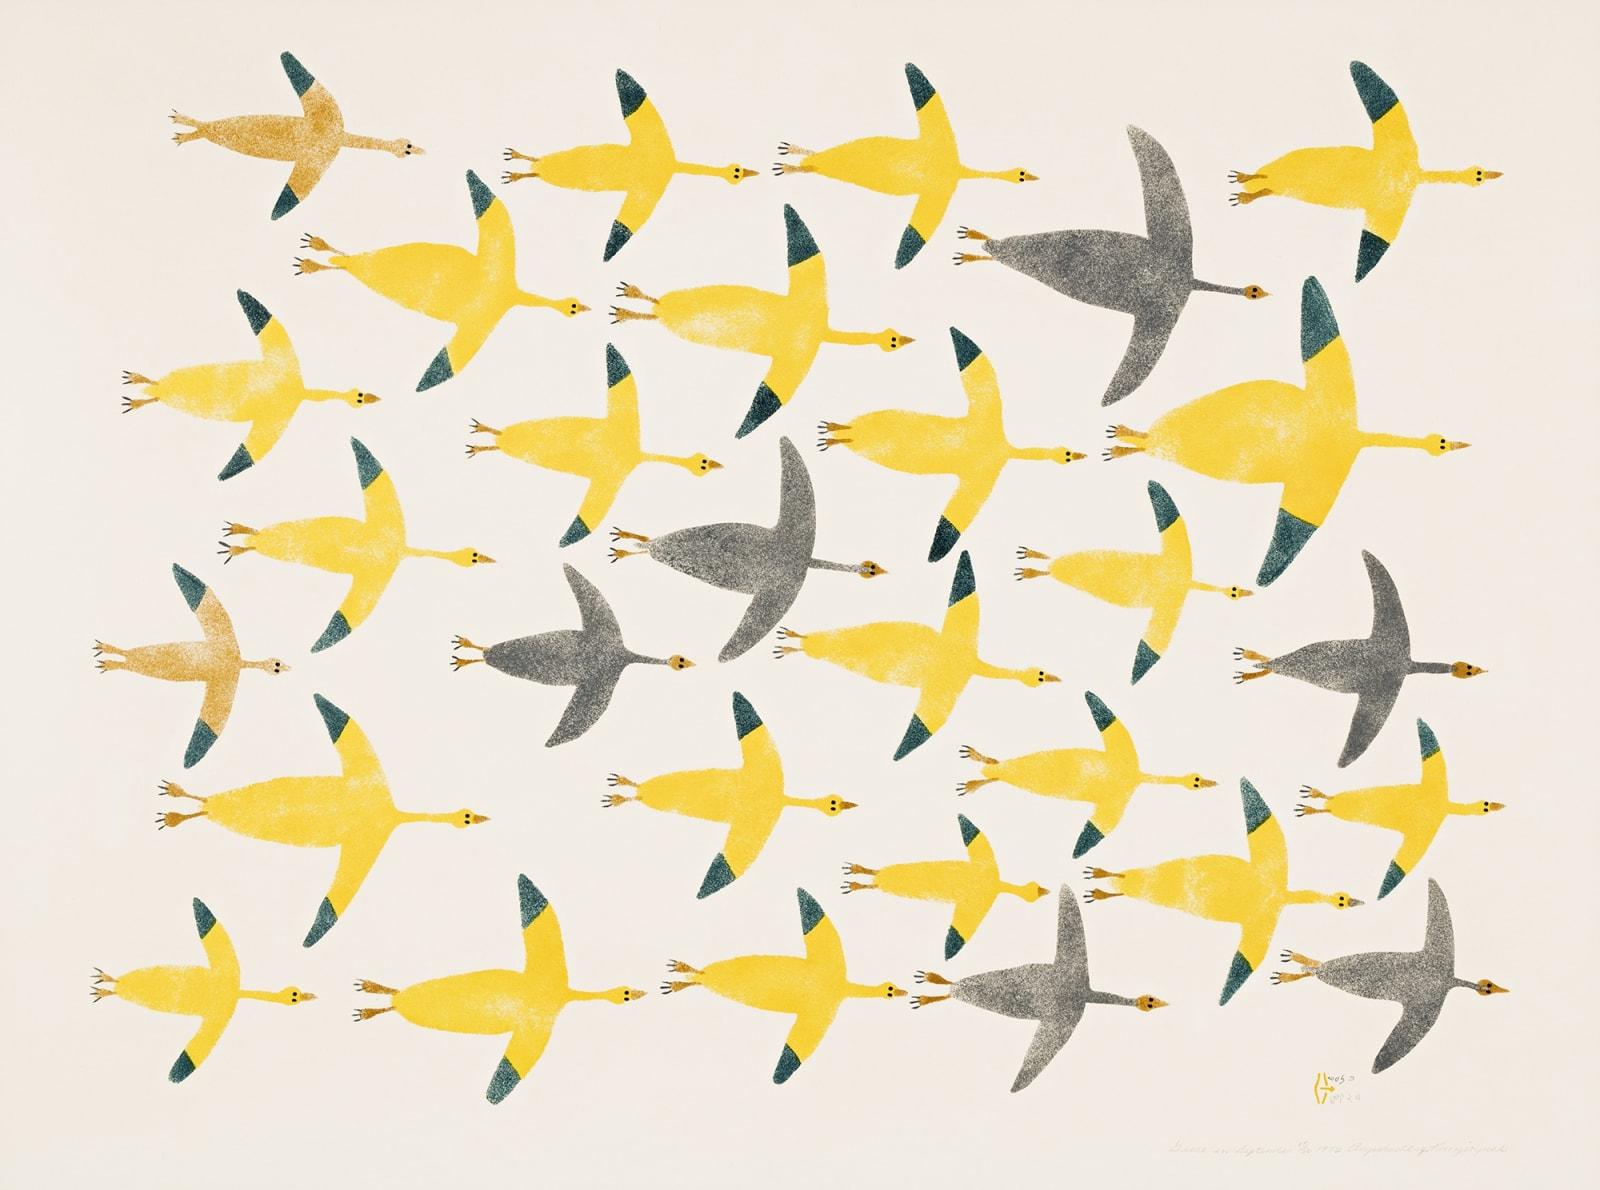 Lot 86 LUKE ANGUHADLUQ (1895-1982) QAMANI'TUAQ (BAKER LAKE) Geese in September, 1972 (1973 #3) stencil, framed, sight: 28.5 x 42.5 in (72.4 x 108 cm) Estimate: $2,500— $3,500